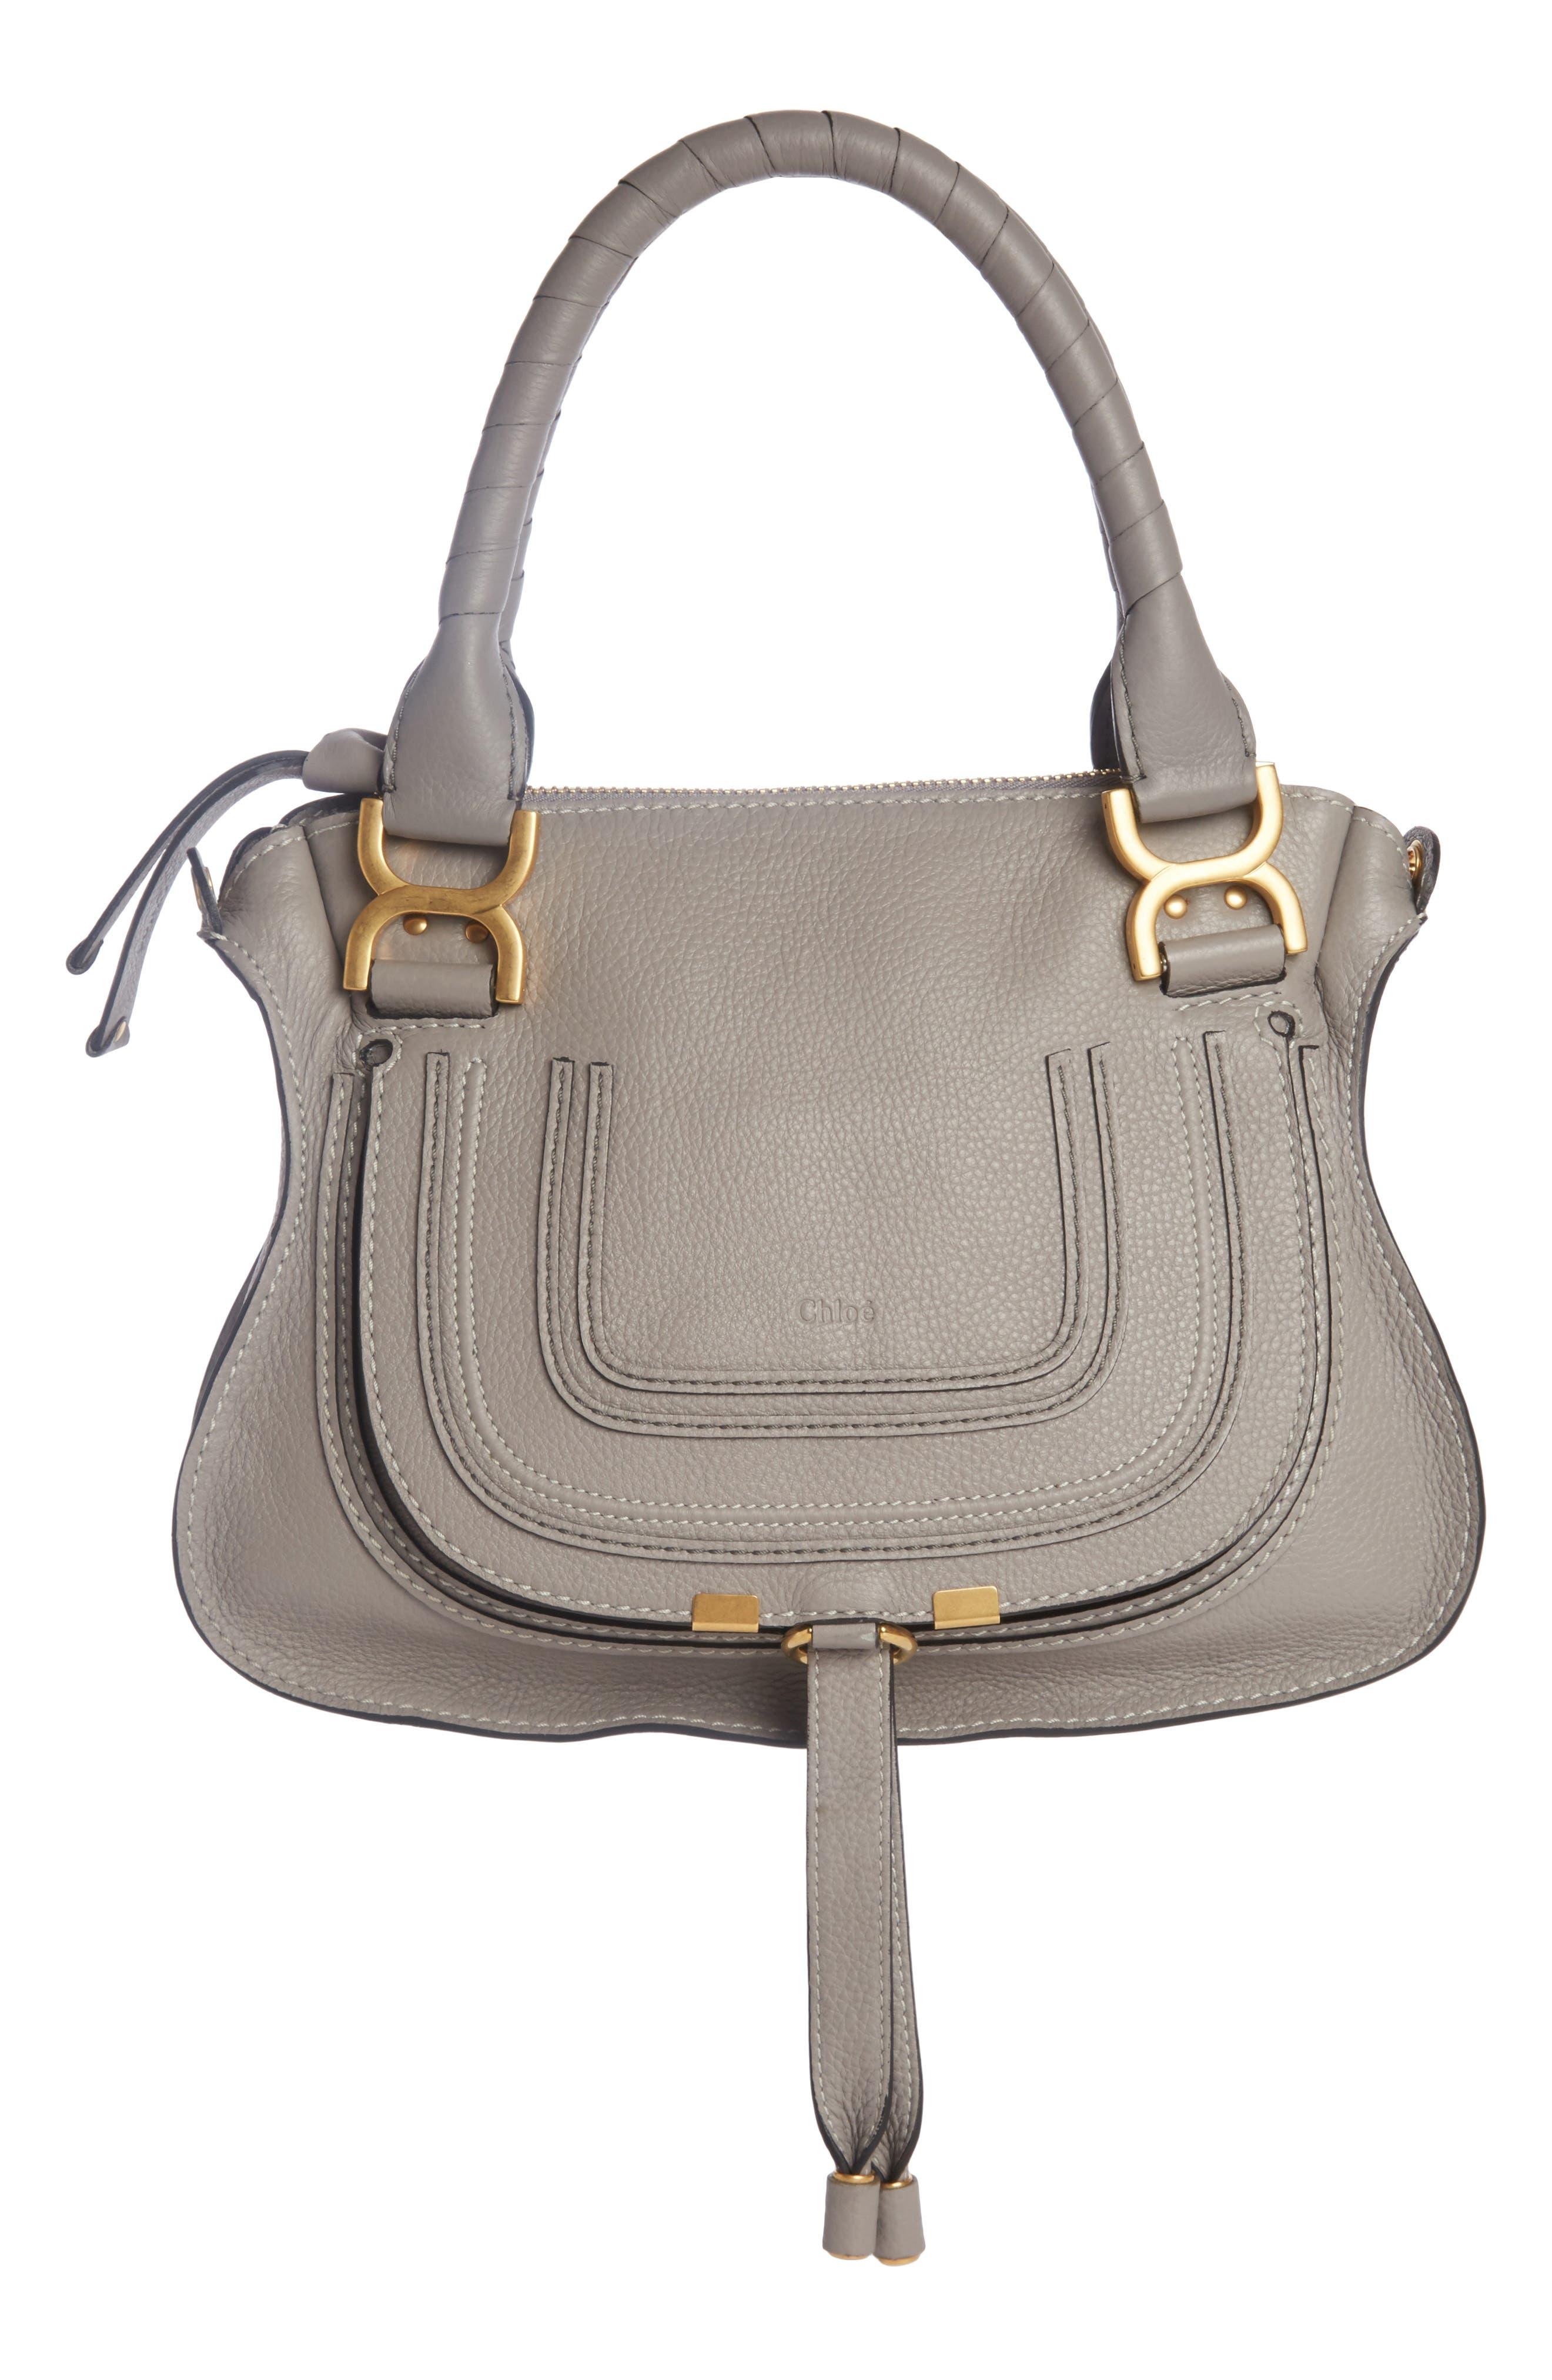 CHLOÉ, Marcie Small Double Carry Bag, Main thumbnail 1, color, CASHMERE GREY